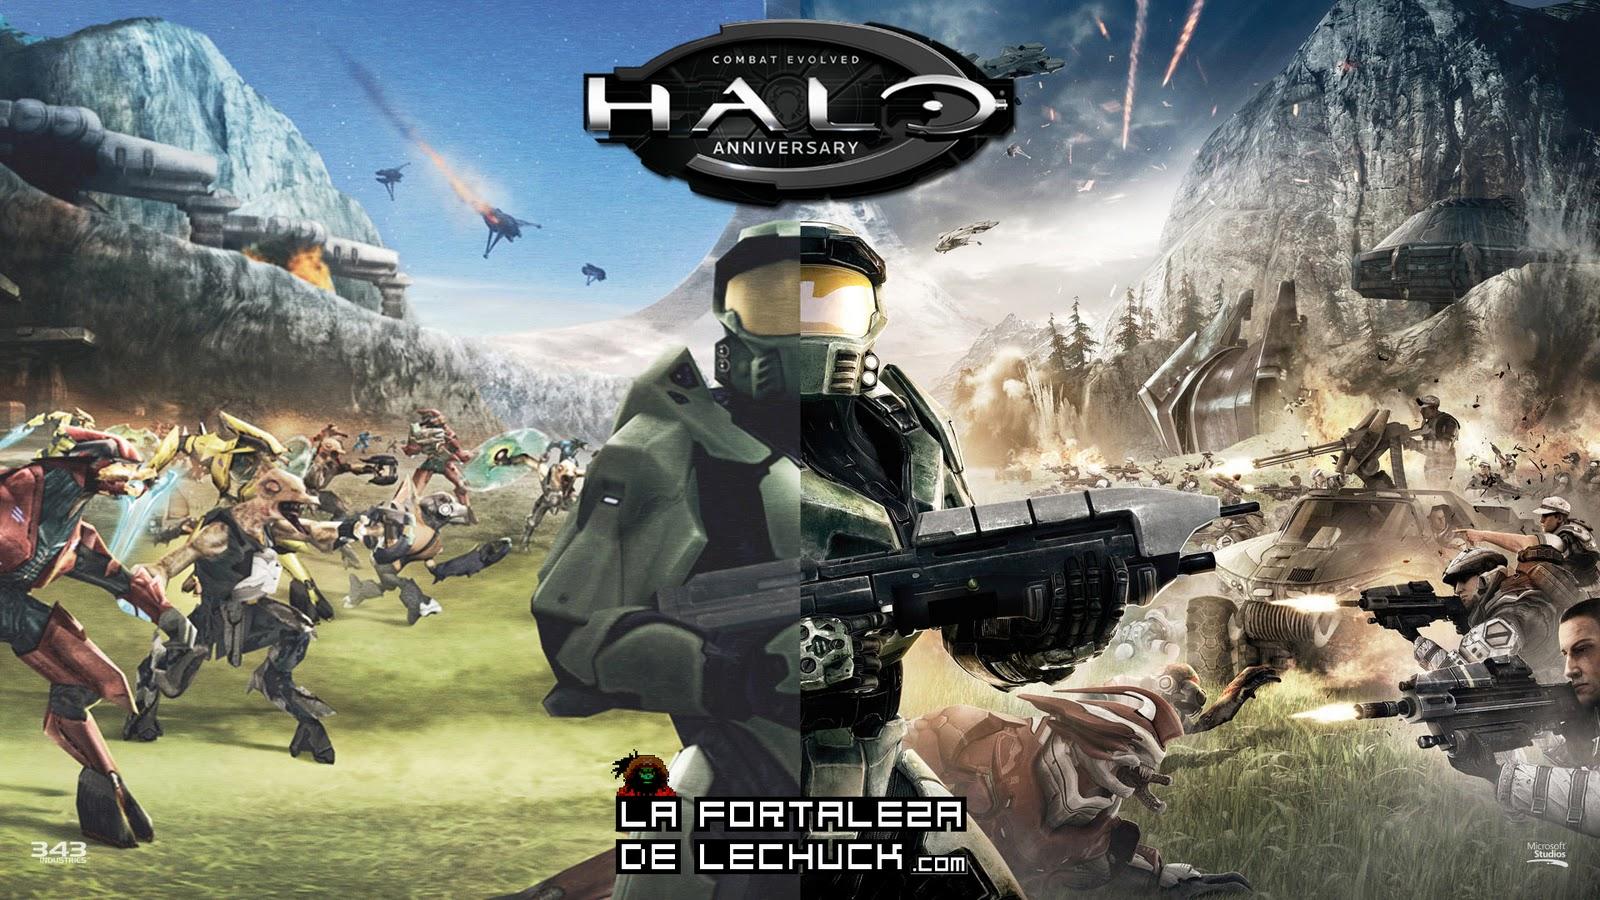 http://4.bp.blogspot.com/-DCDUHYF7uS4/TsvOODuXVSI/AAAAAAAACfA/PI-MABxV3mc/s1600/Halo-Combat-Evolved-10-Years-Anniversary-logo-wallpaper.jpg